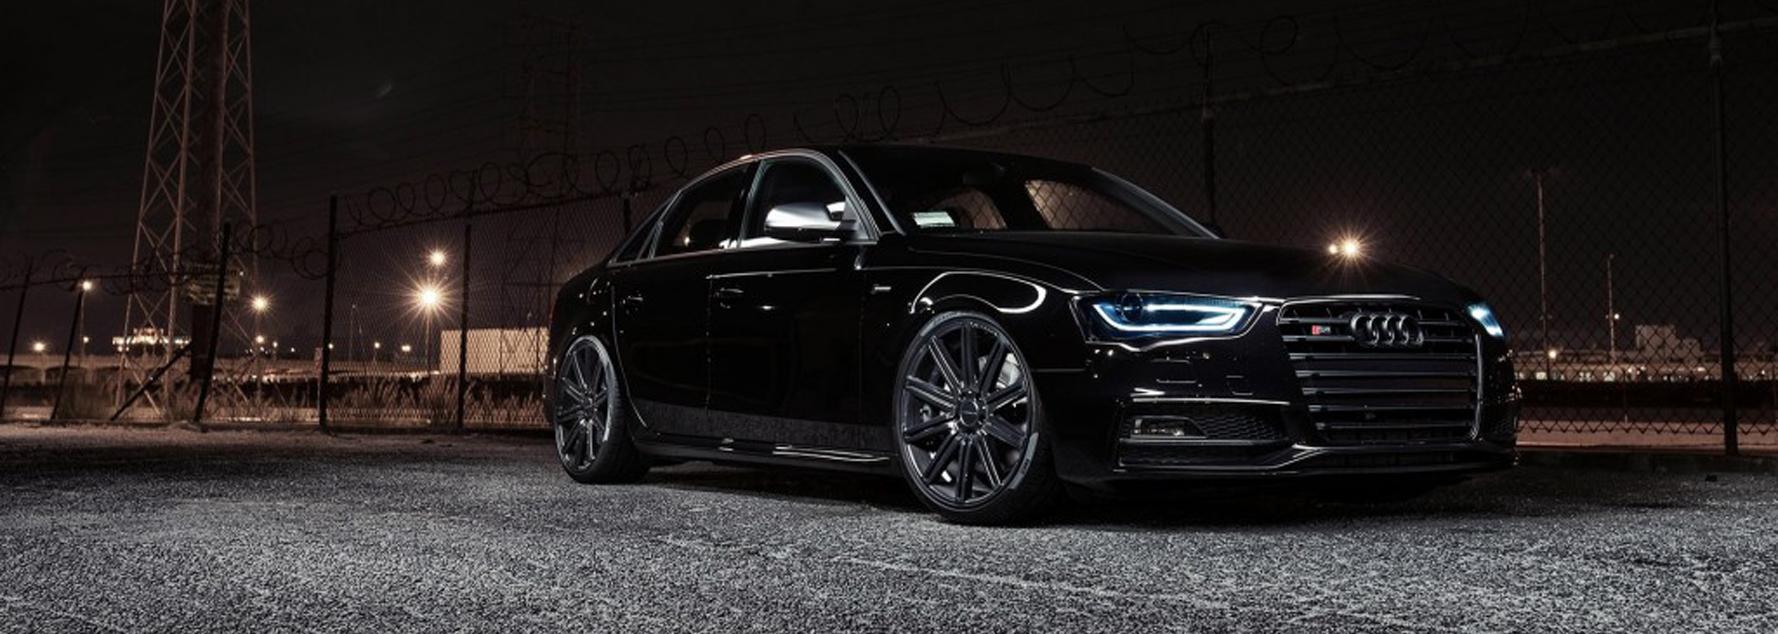 Audi Q5 Suv 2008 2015 Black Floor Mats Rhd With Sline Logo